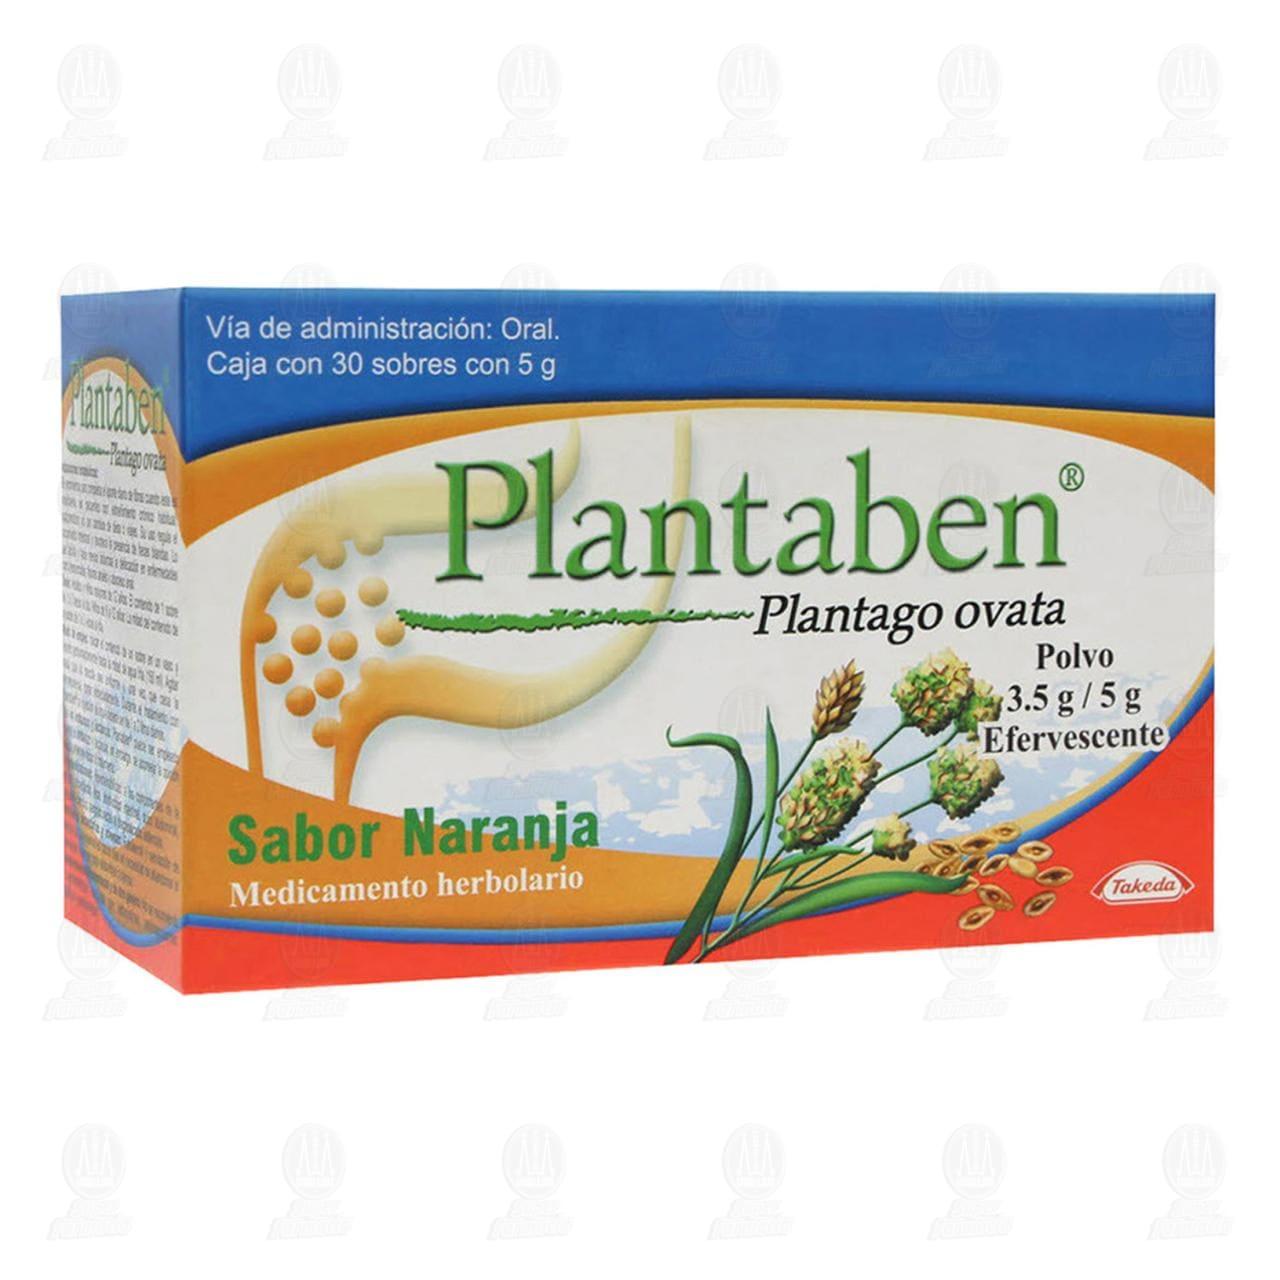 Plantaben 5gr 30 Sobres Polvo Efervescente Sabor Naranja